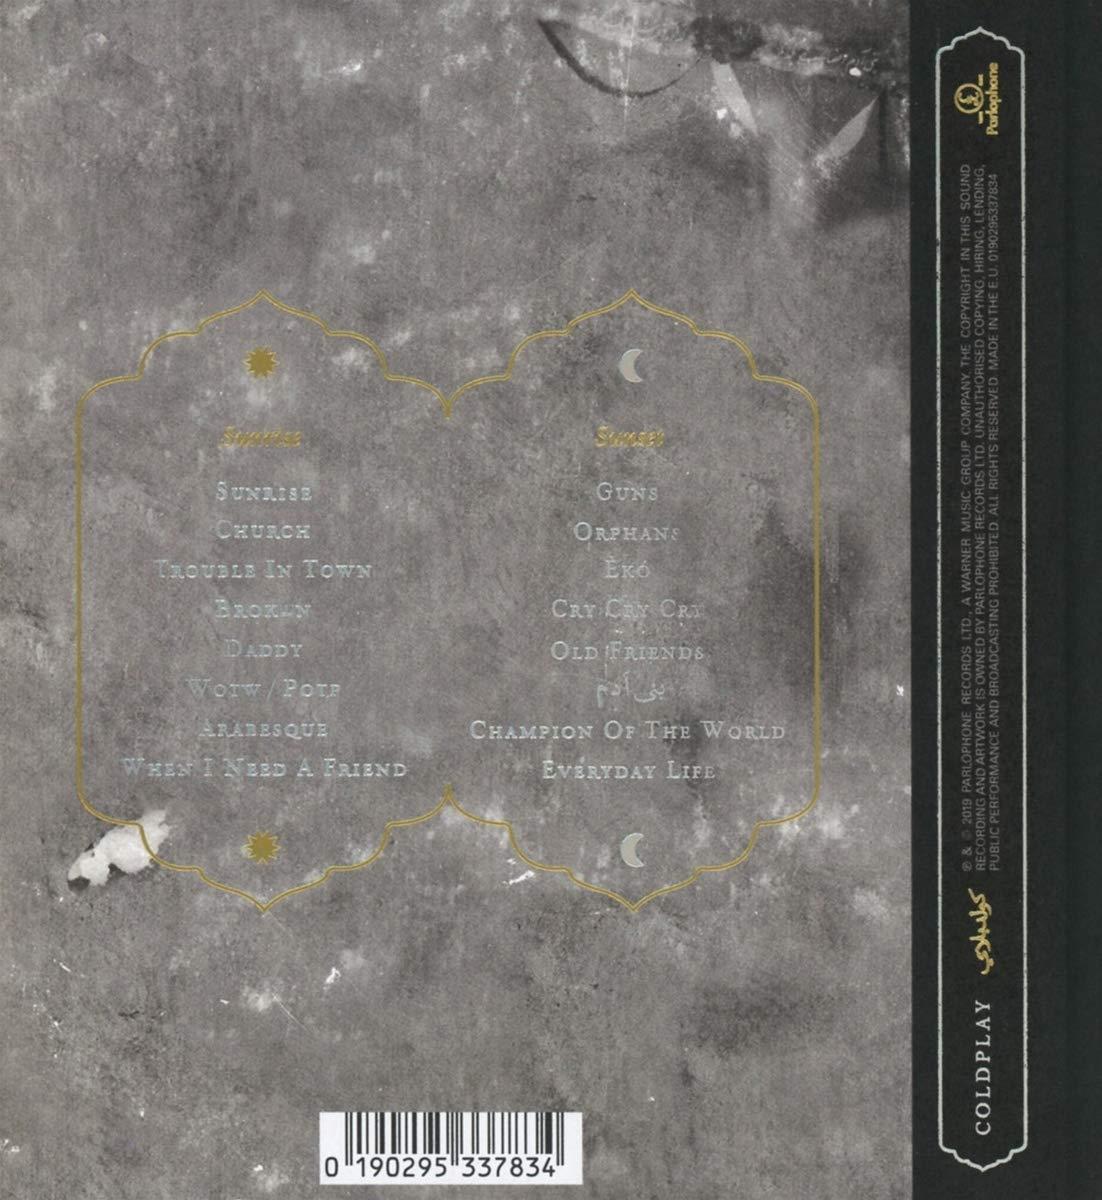 Coldplay - Everyday Life : Coldplay, Coldplay: Amazon.es: Música